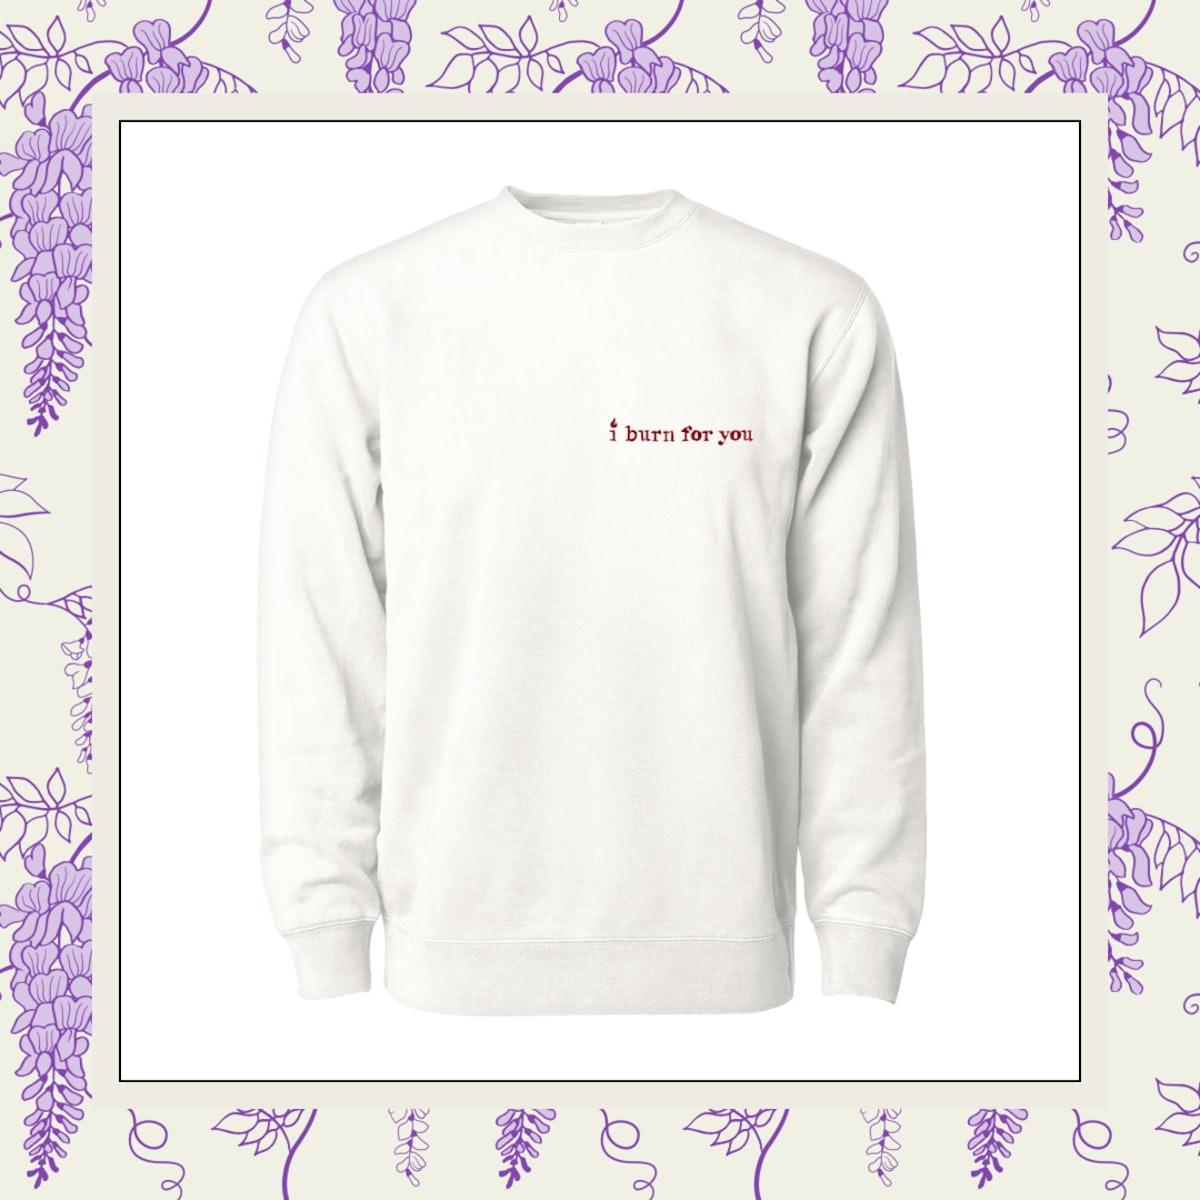 Phenomenal x Bridgerton Collab (I Burn For You) Crewneck Sweatshirt